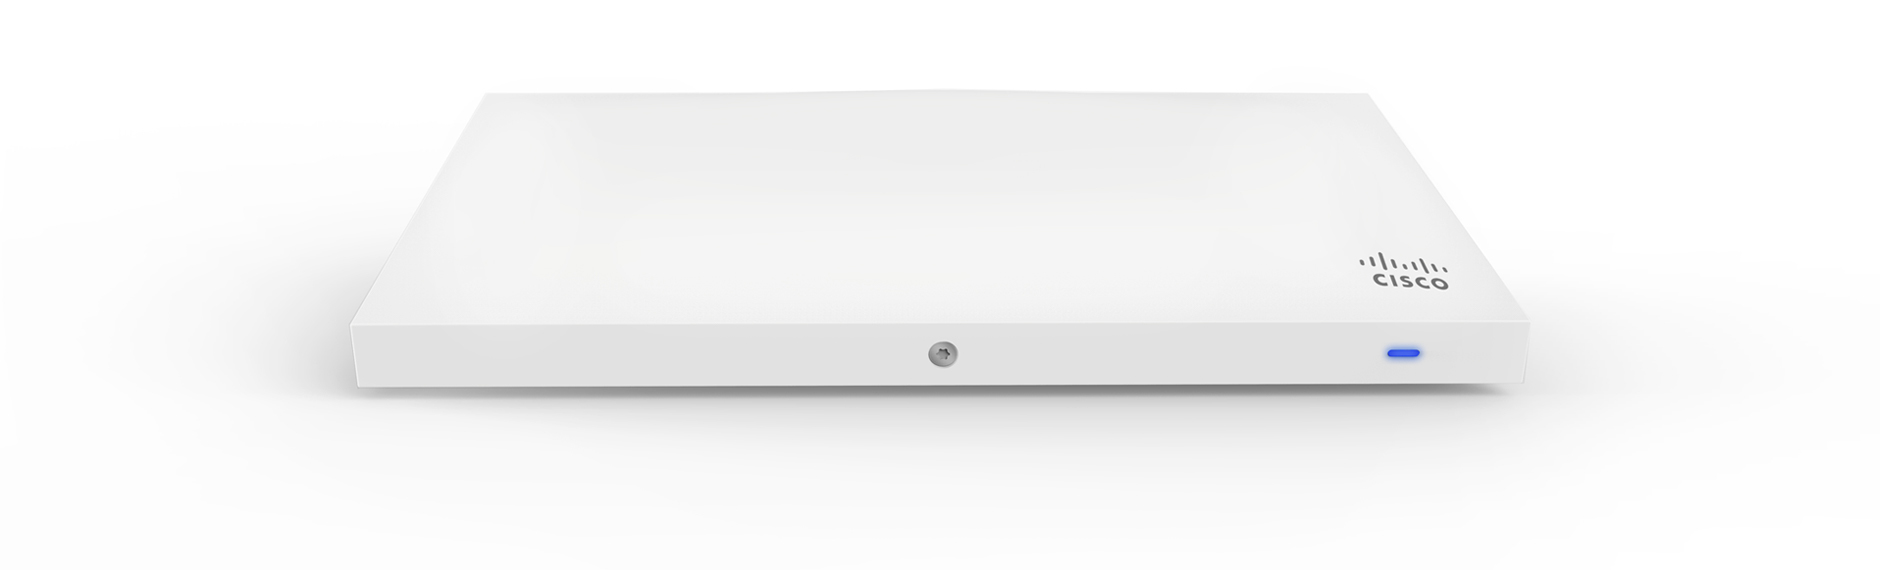 MR33 -HW Aruba 2530 48G PoE+ Switch